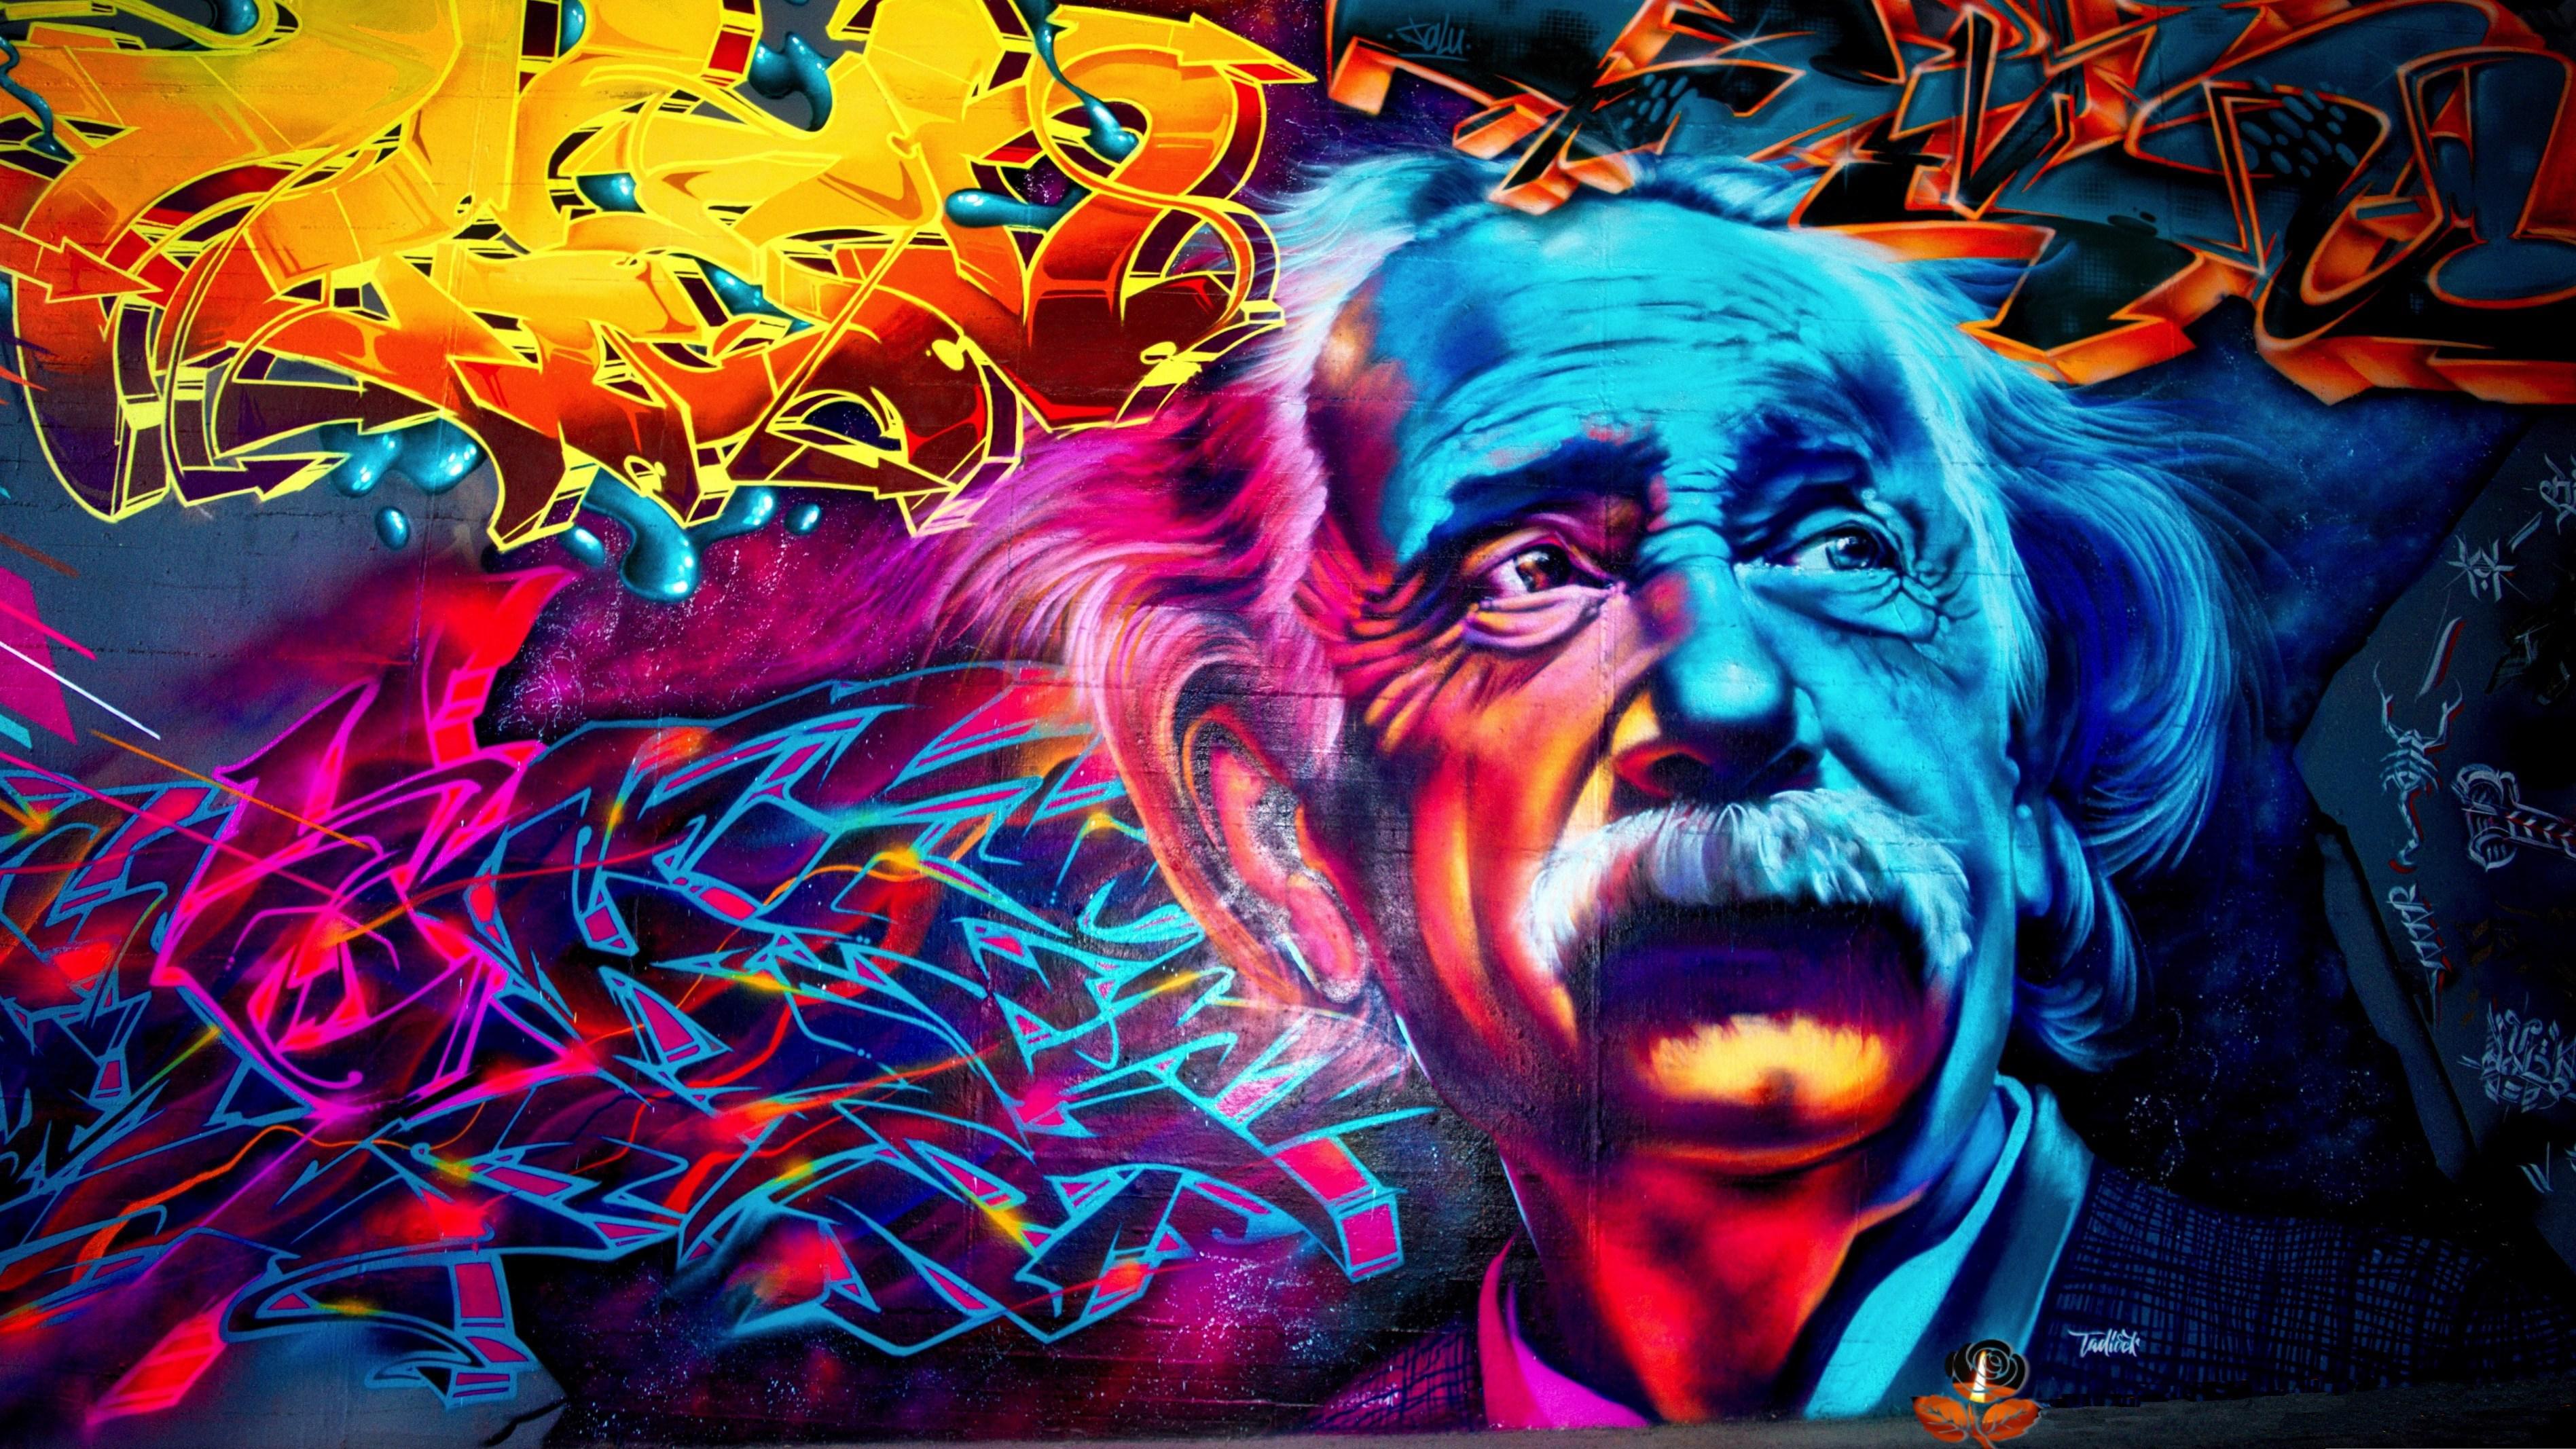 Einstein graffiti street art [3793x2134] wallpapers 3793x2134